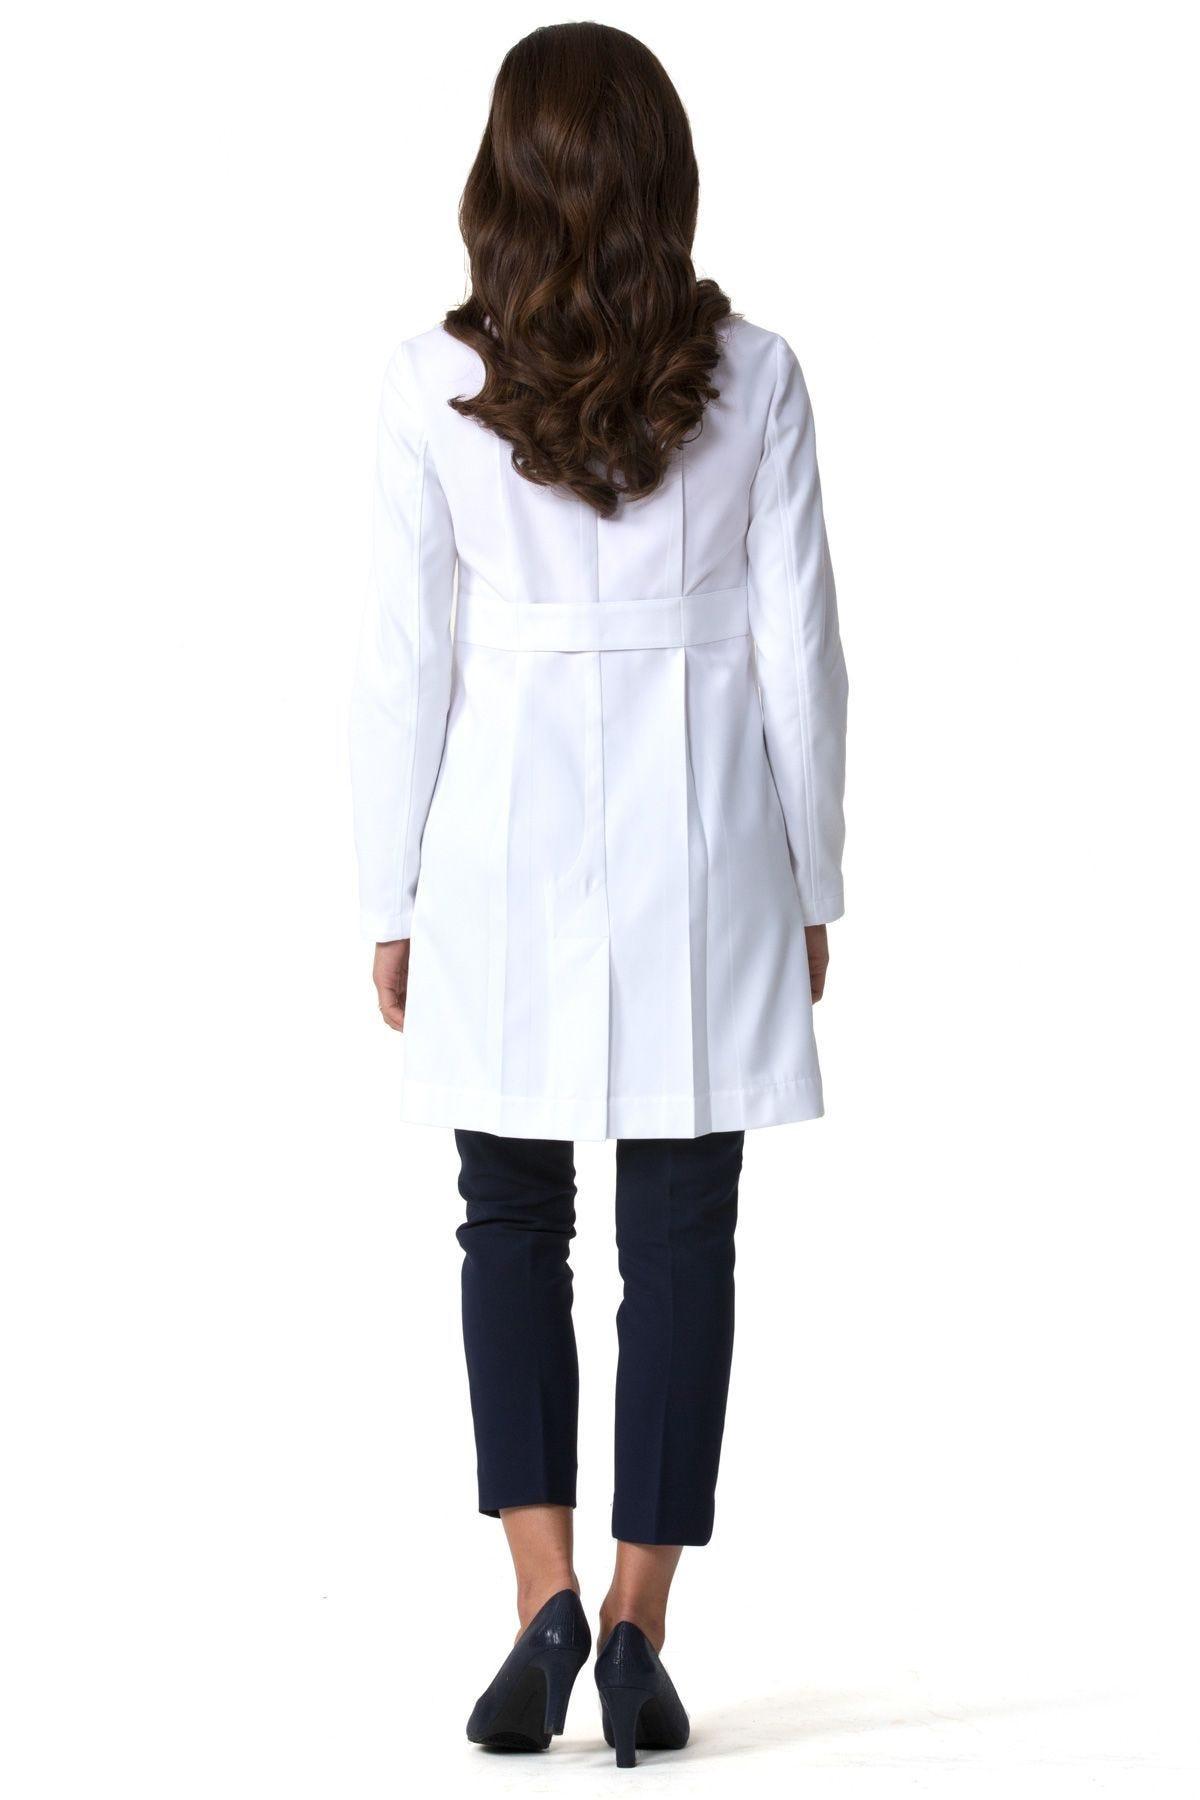 White lab apron -  M3 Ellody Lab Coat Petite Fit